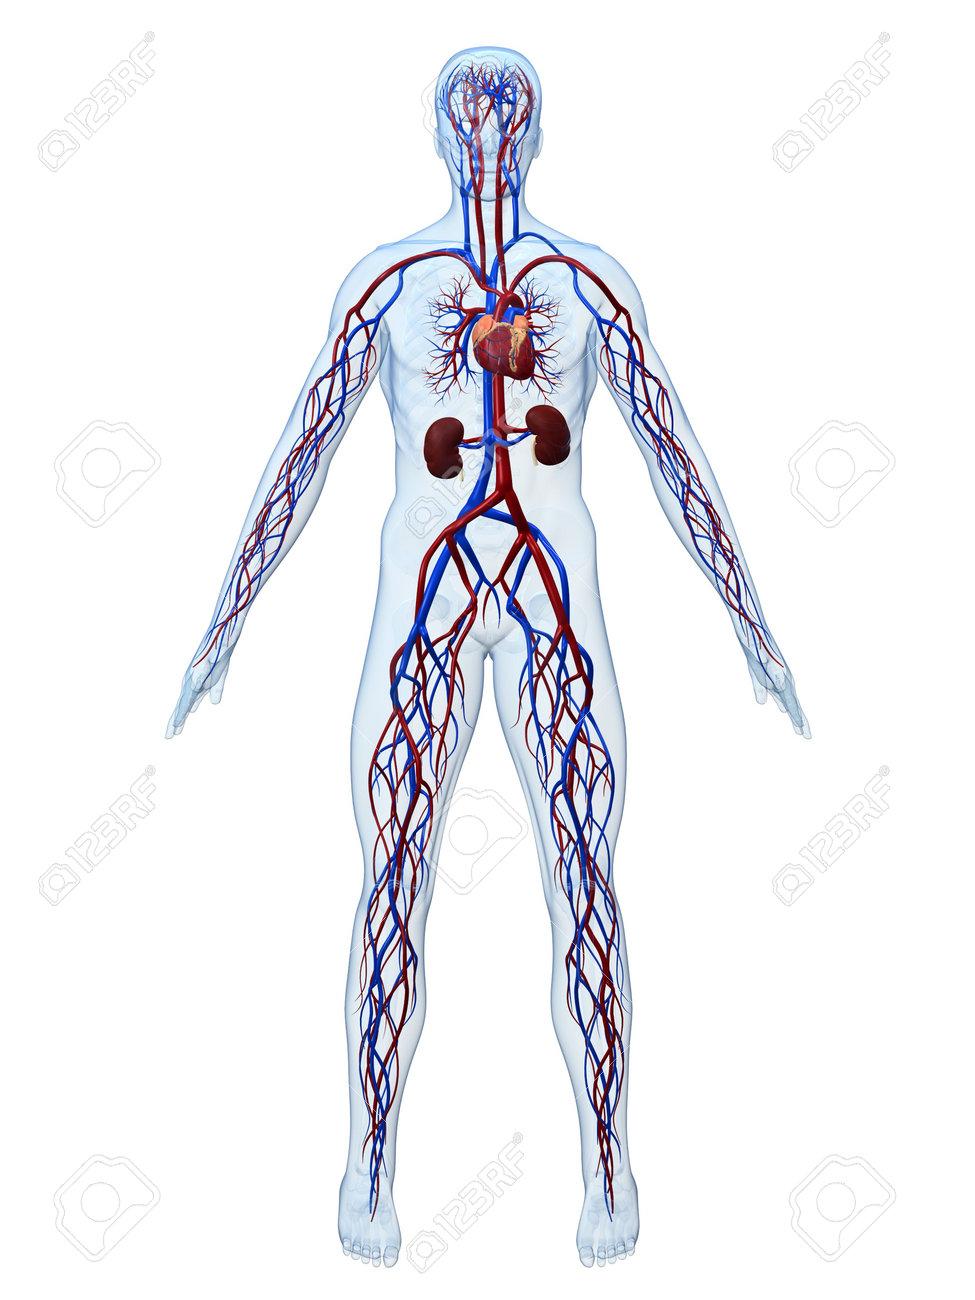 cardiovascular system Stock Photo - 3196846